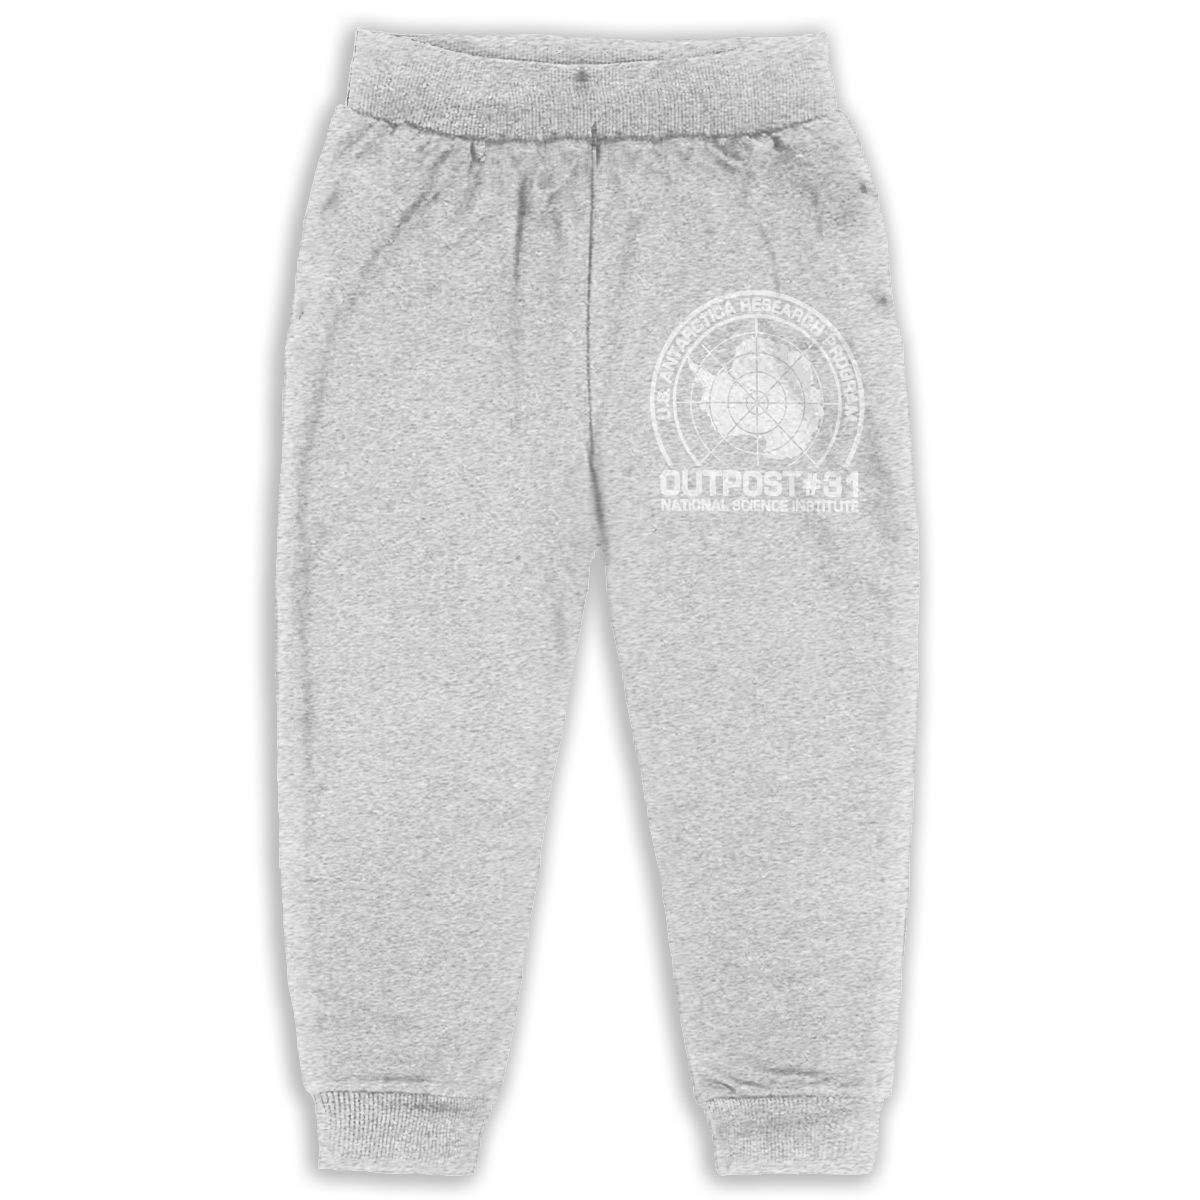 DaXi1 Outpost 31 Antarctica Research Sweatpants for Boys /& Girls Fleece Active Joggers Elastic Pants